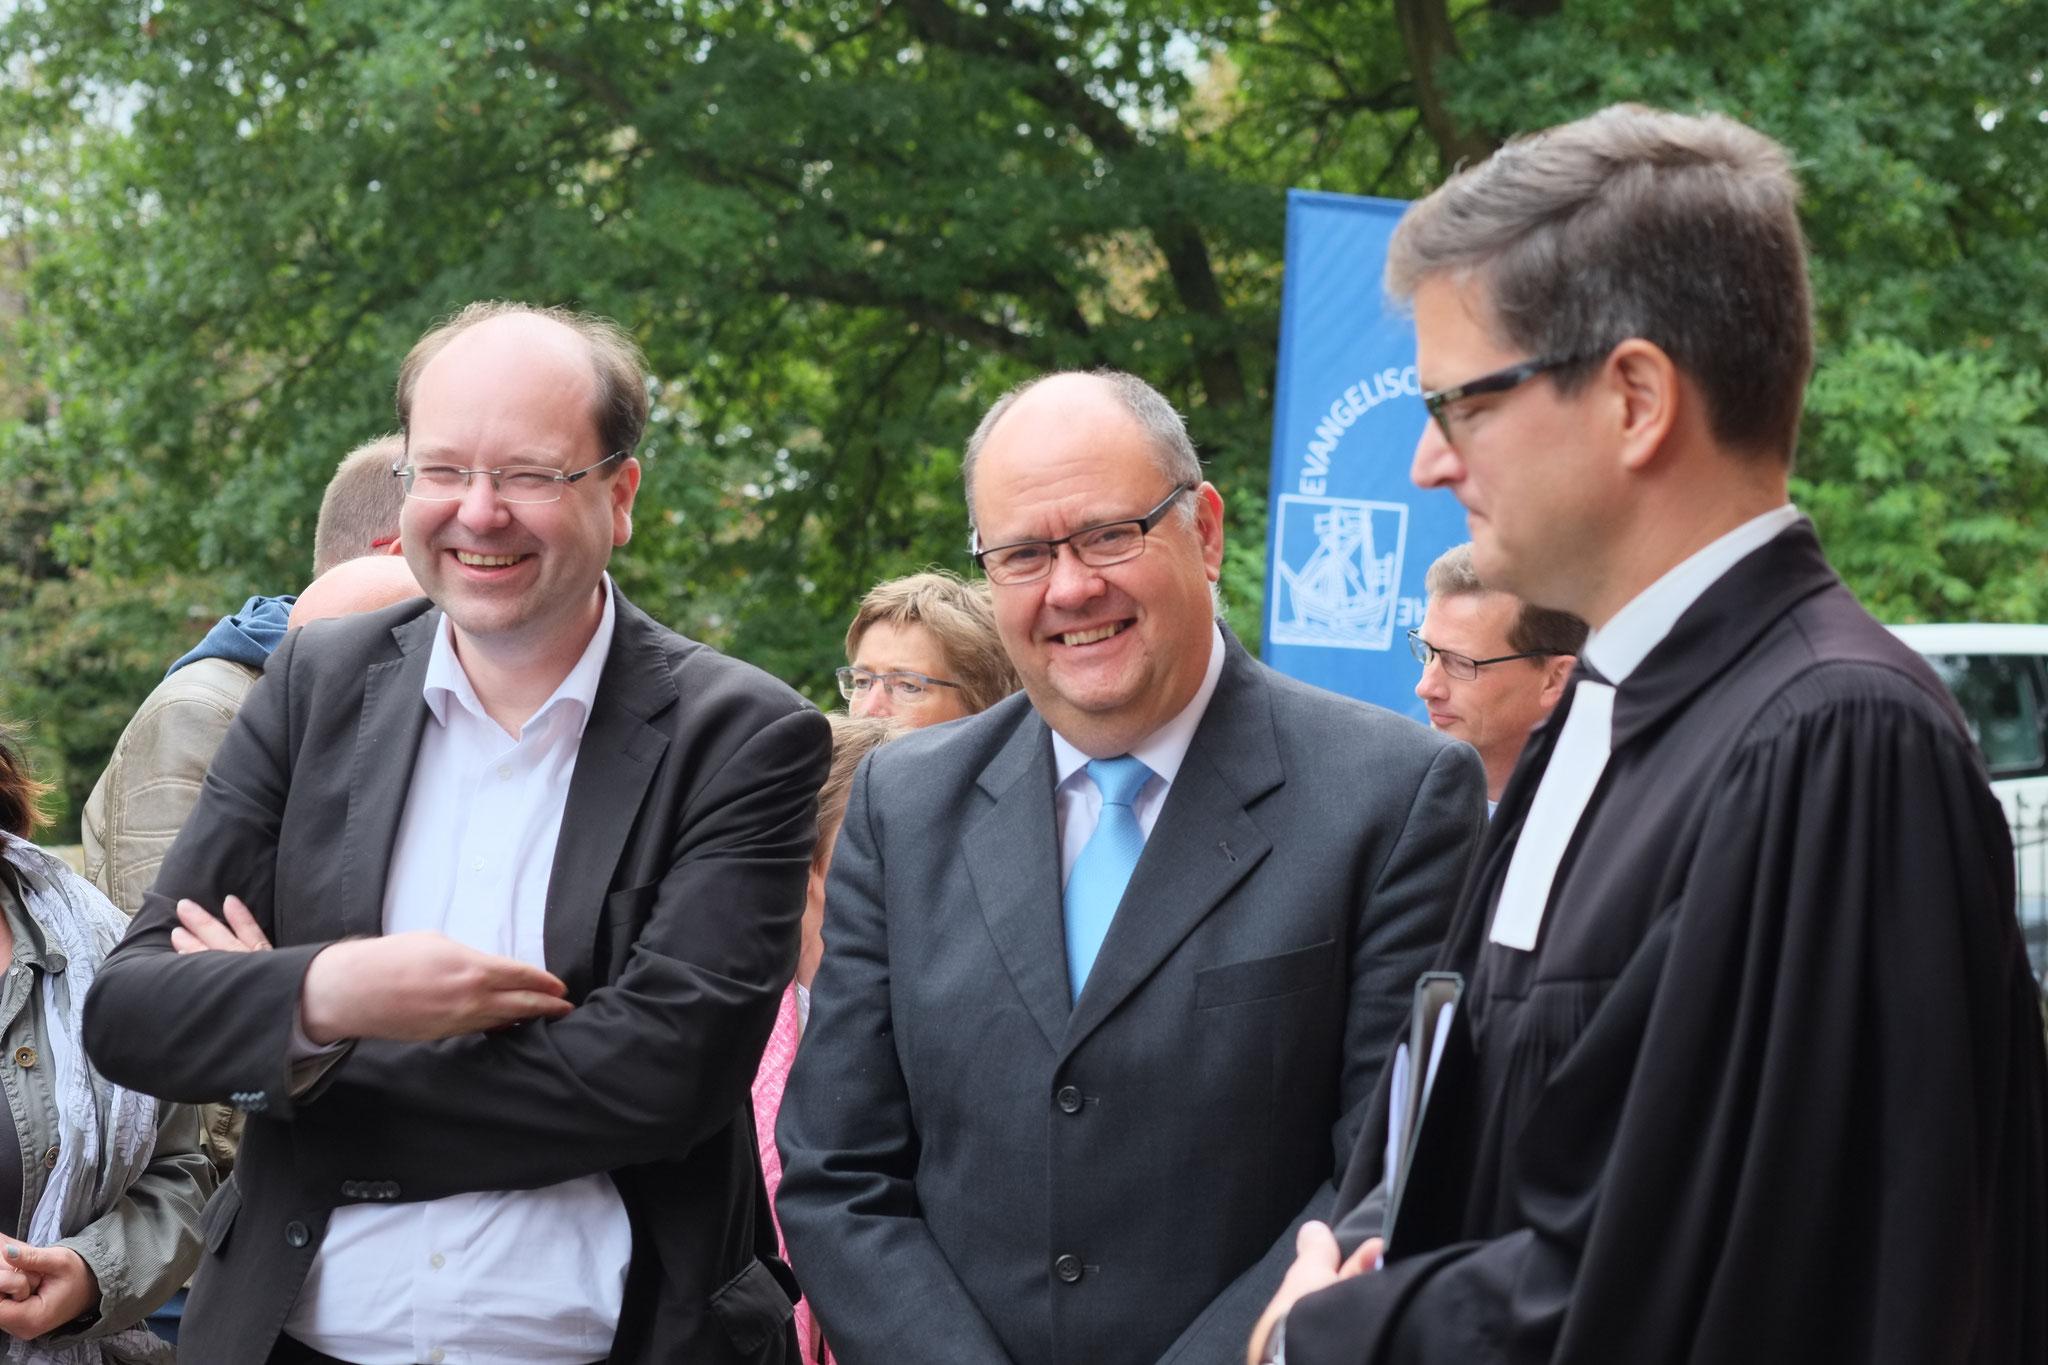 Landeserntedankfest 02.10.2016 in Hinte, Foto: Marketinggesellschaft